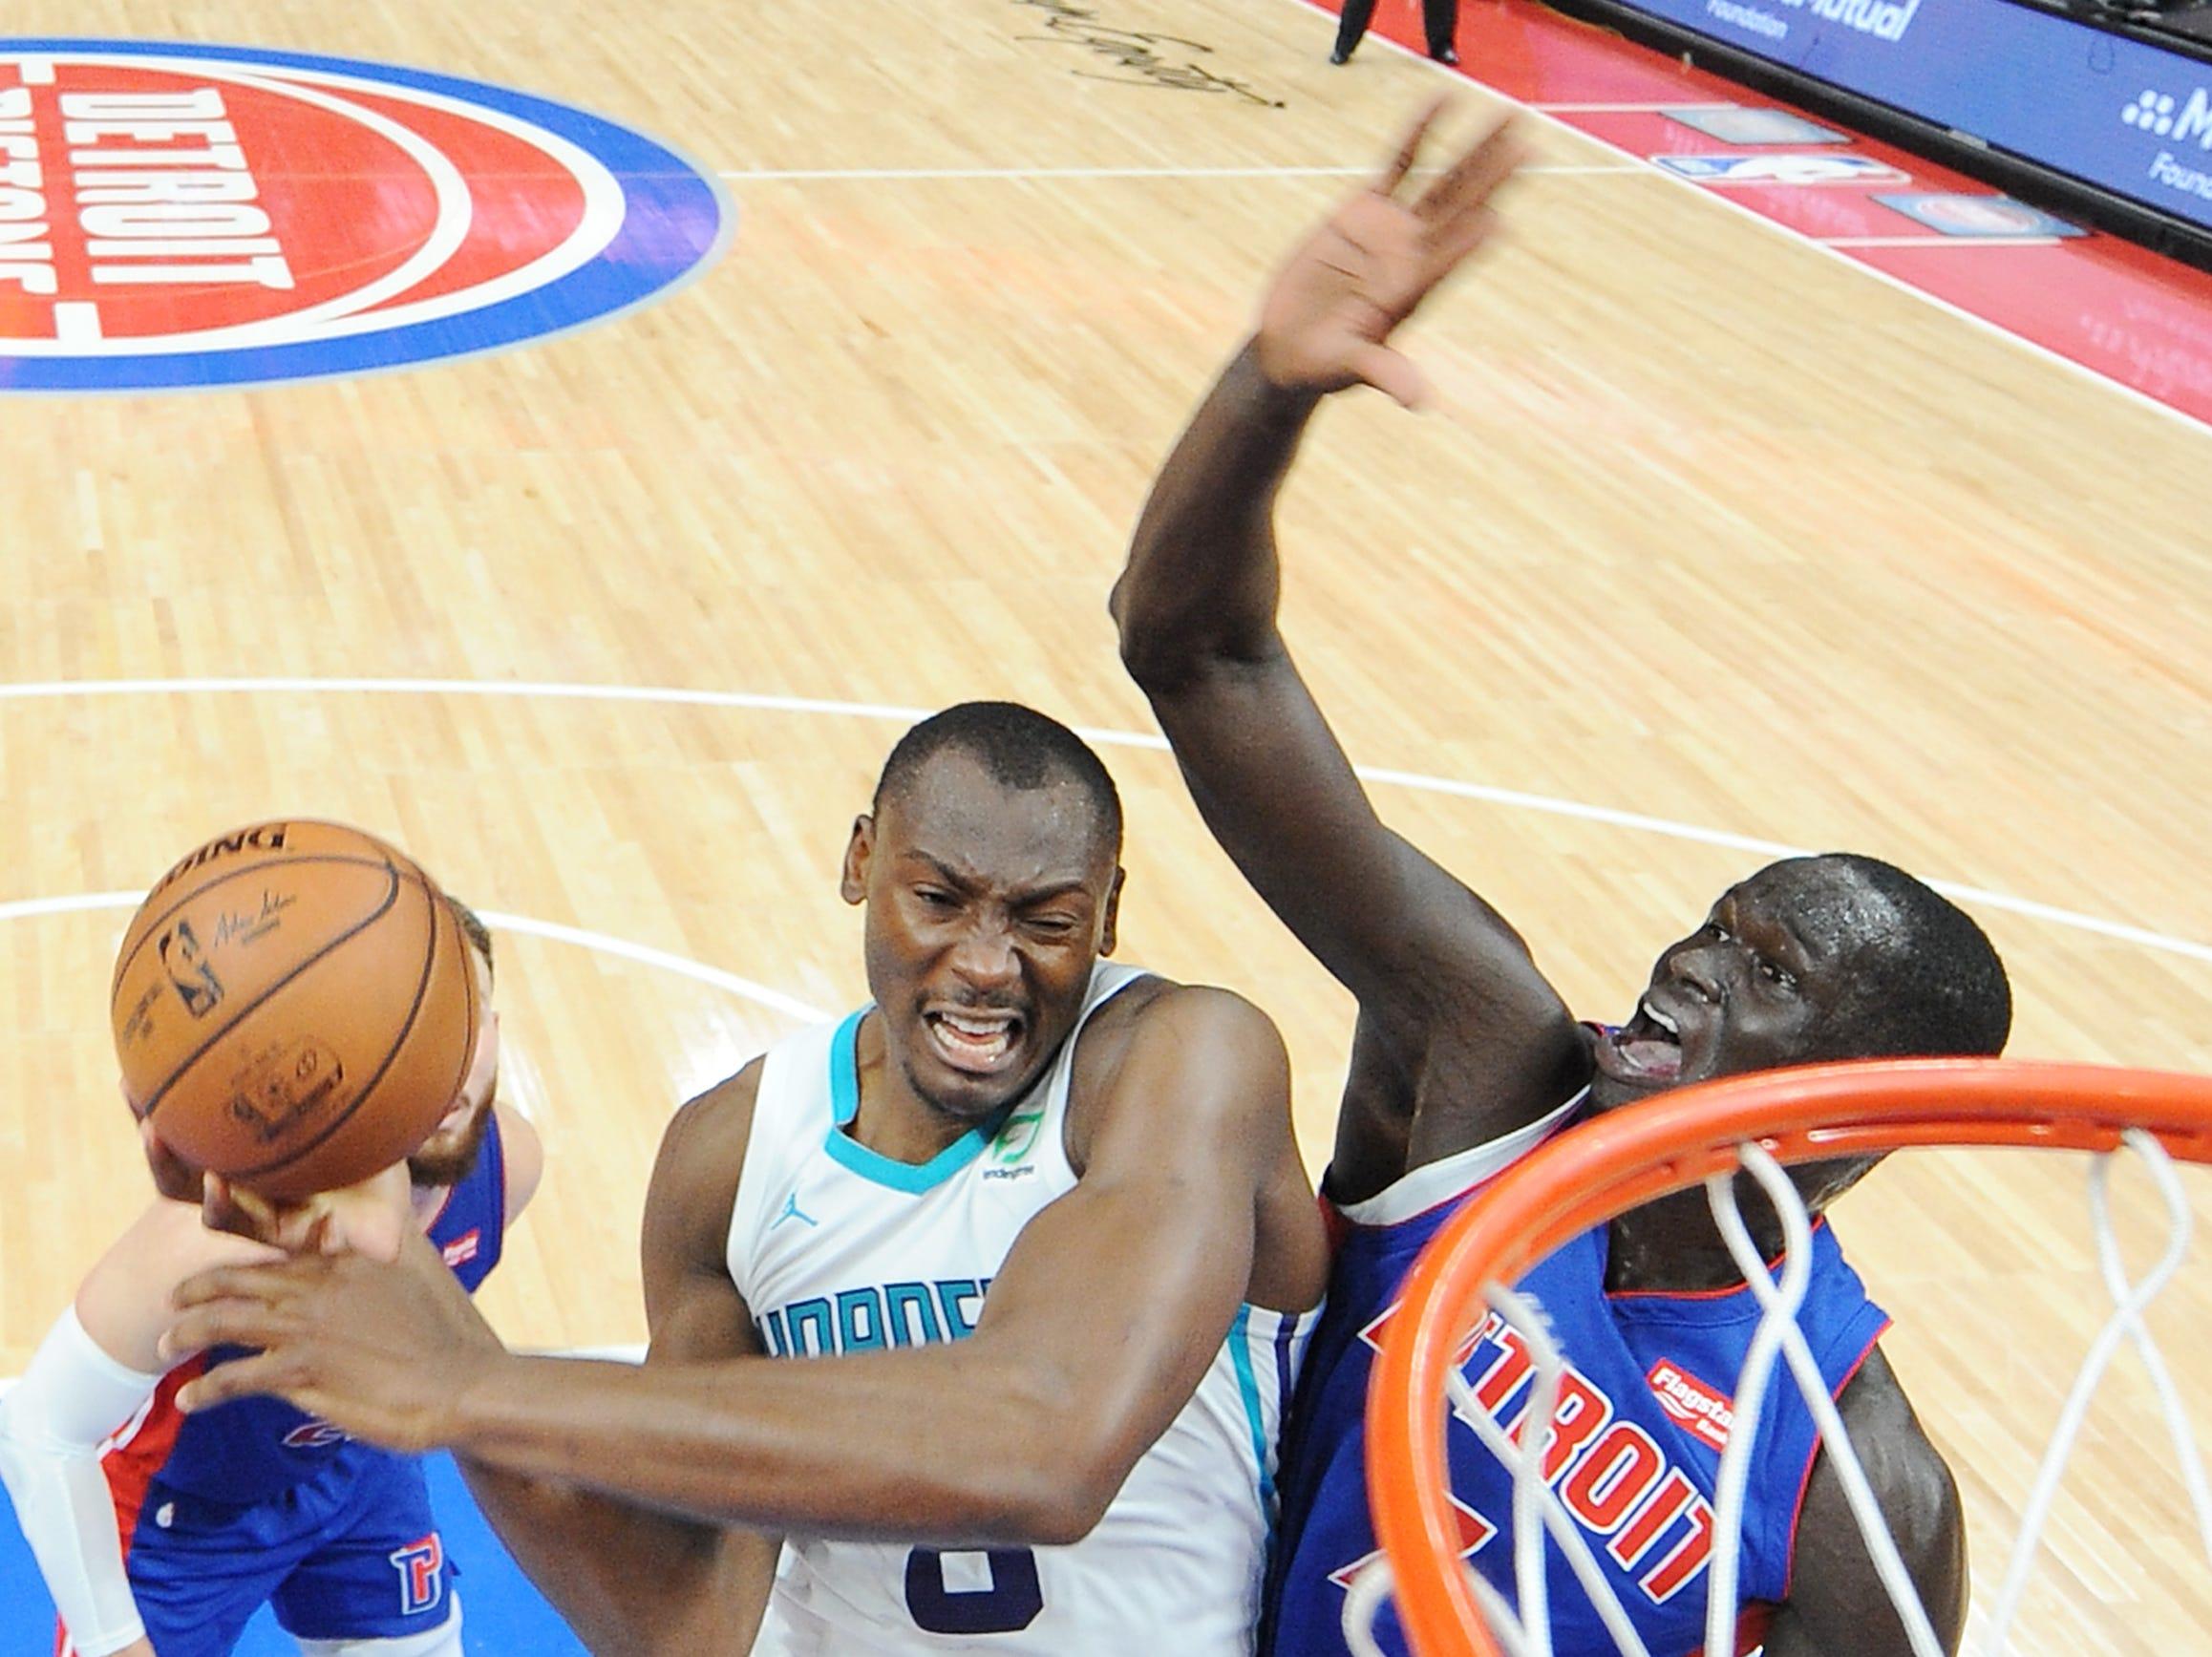 Hornets' Bismack Biyombo shoots over Pistons' Thon Maker in the second quarter.